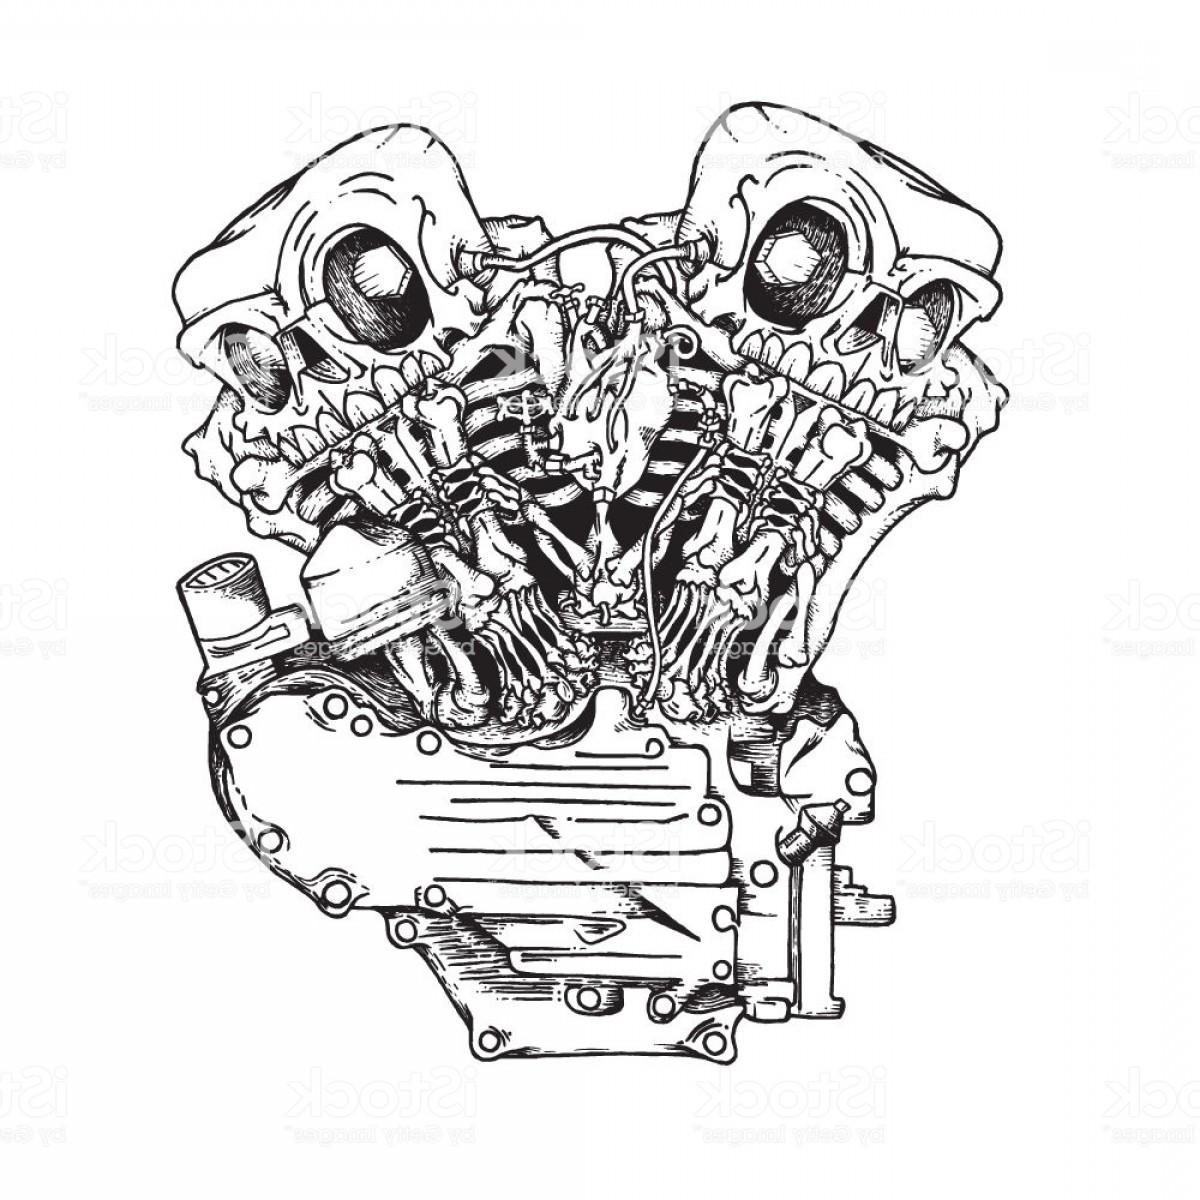 Motorcycle Engine Sketch At Paintingvalley